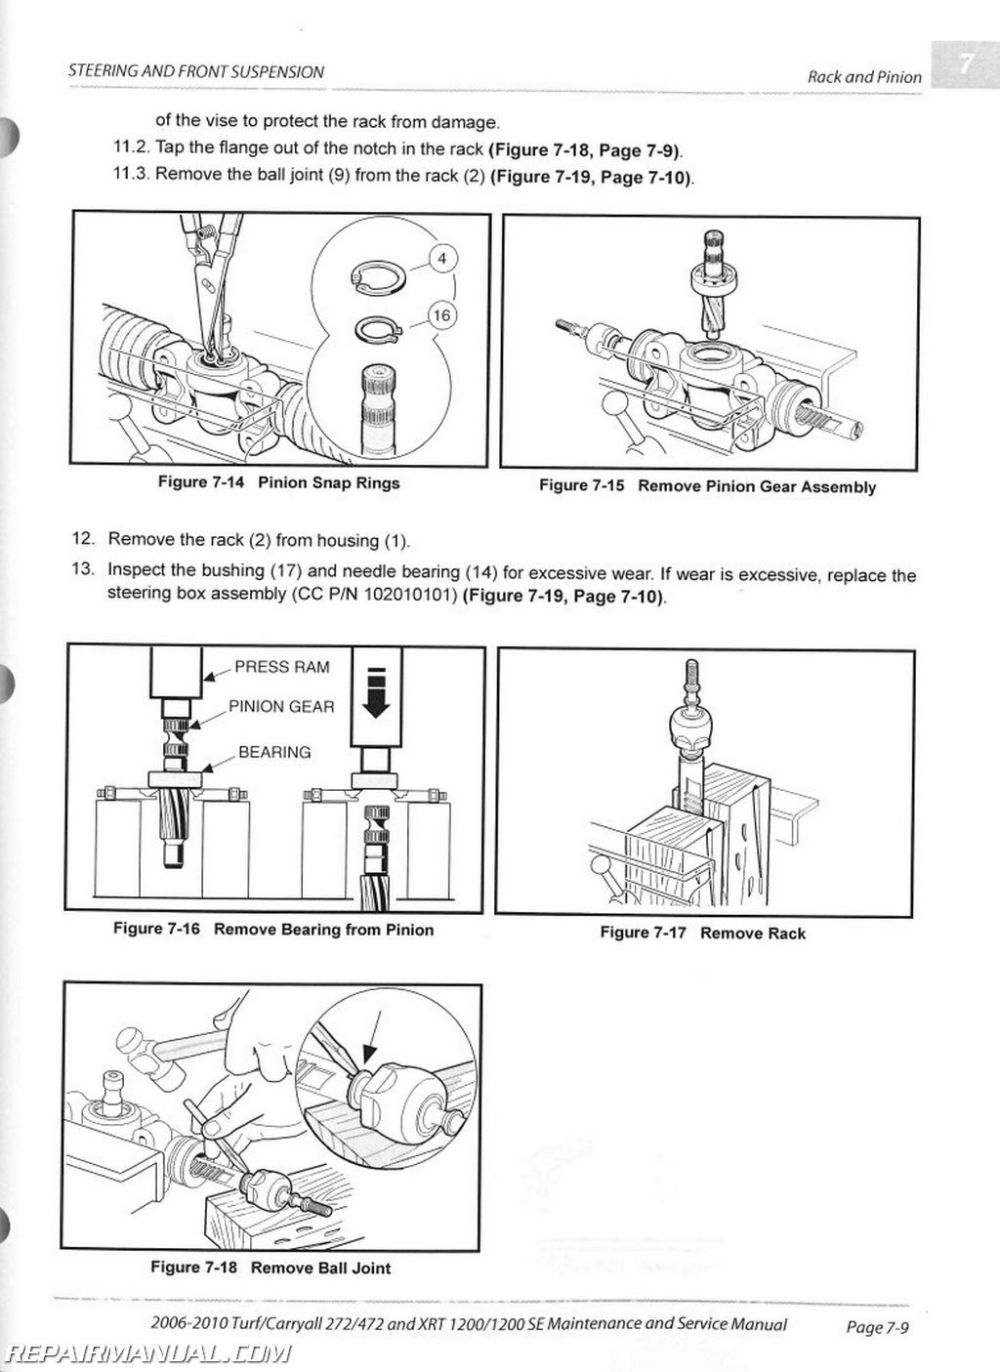 medium resolution of 2006 2010 club car turf carryall 272 472 xrt1200 se turf 272 rh repairmanual com 2003 gas club car wiring diagram 2008 club car gas wiring diagram